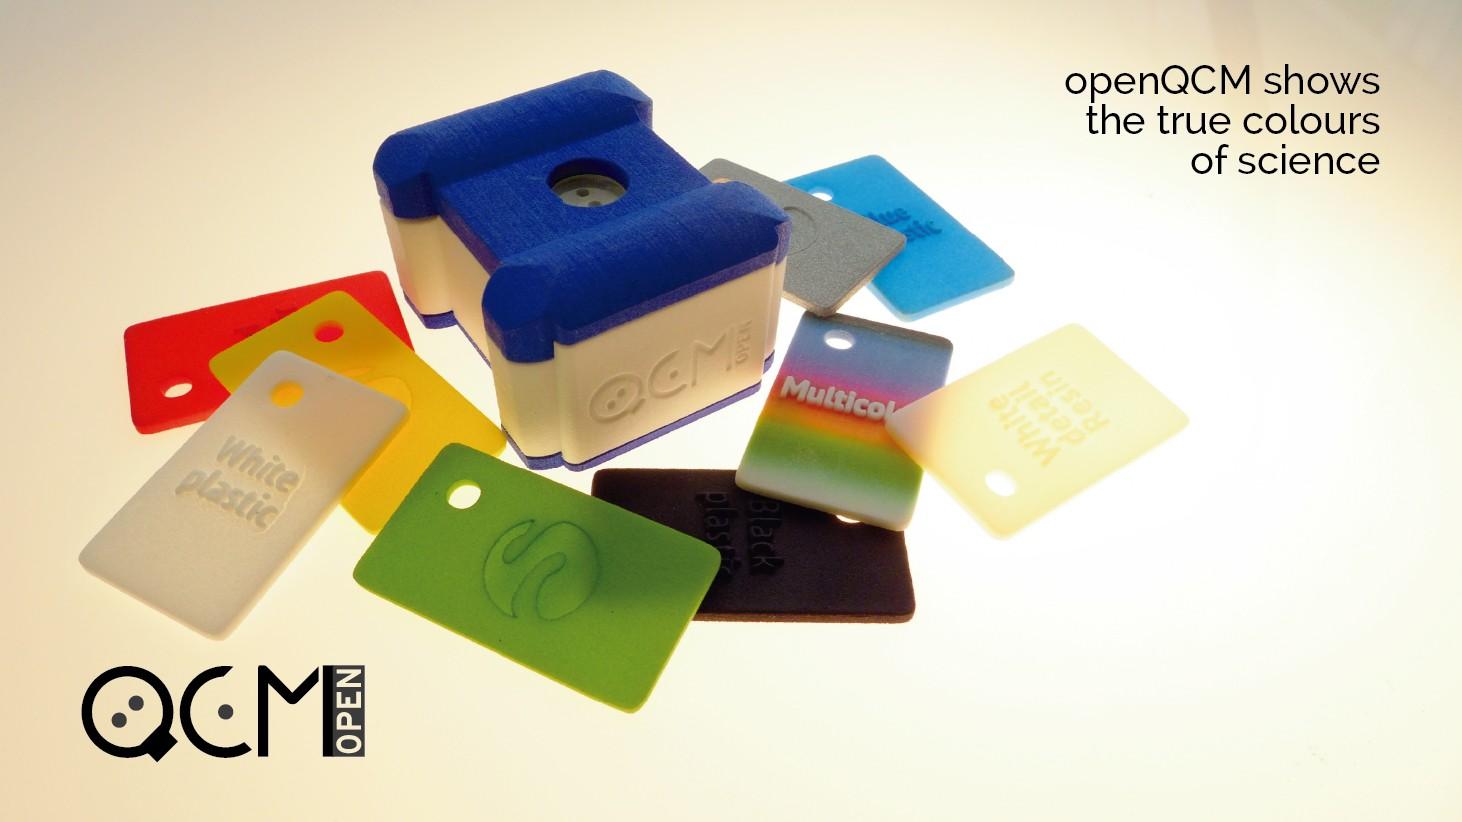 Quartz_Crystal_Microbalance_openQCM-colours-science